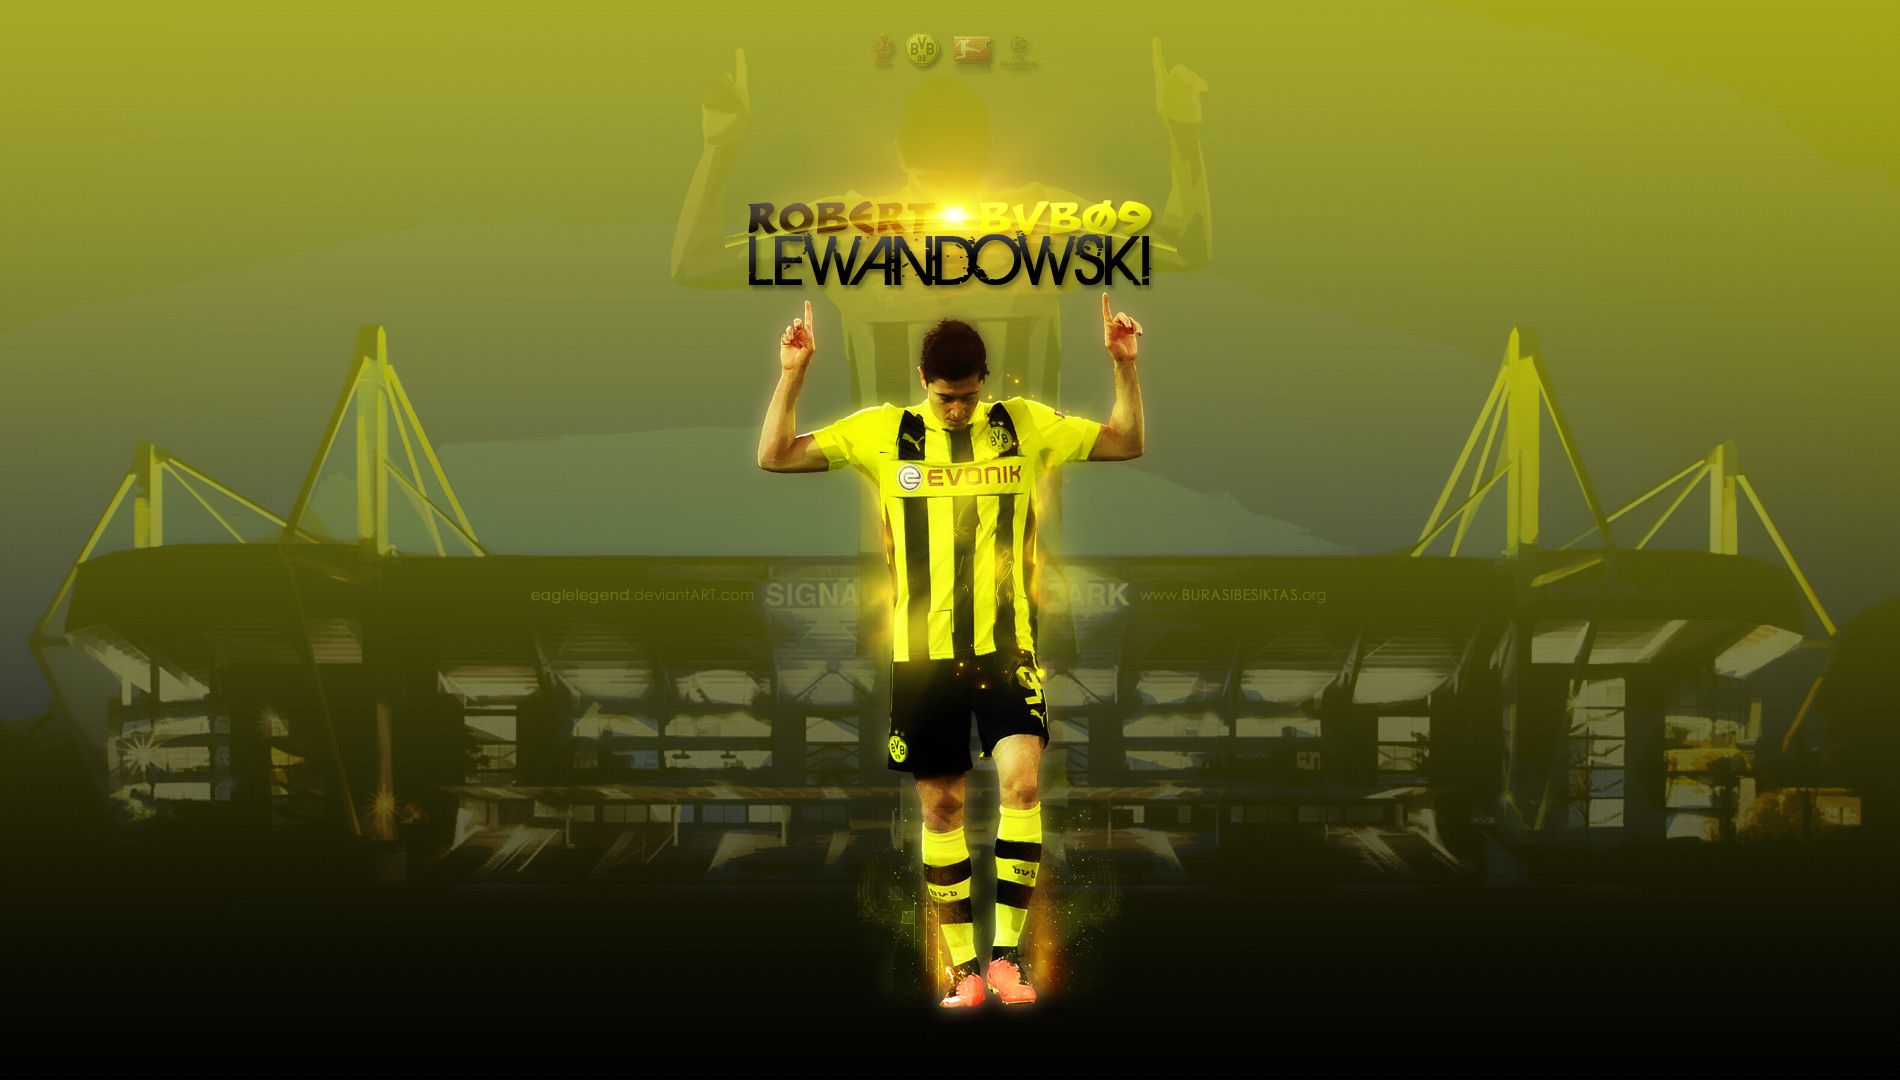 Robert lewandowski wallpaper borussia dortmund pinterest robert lewandowski wallpaper voltagebd Choice Image